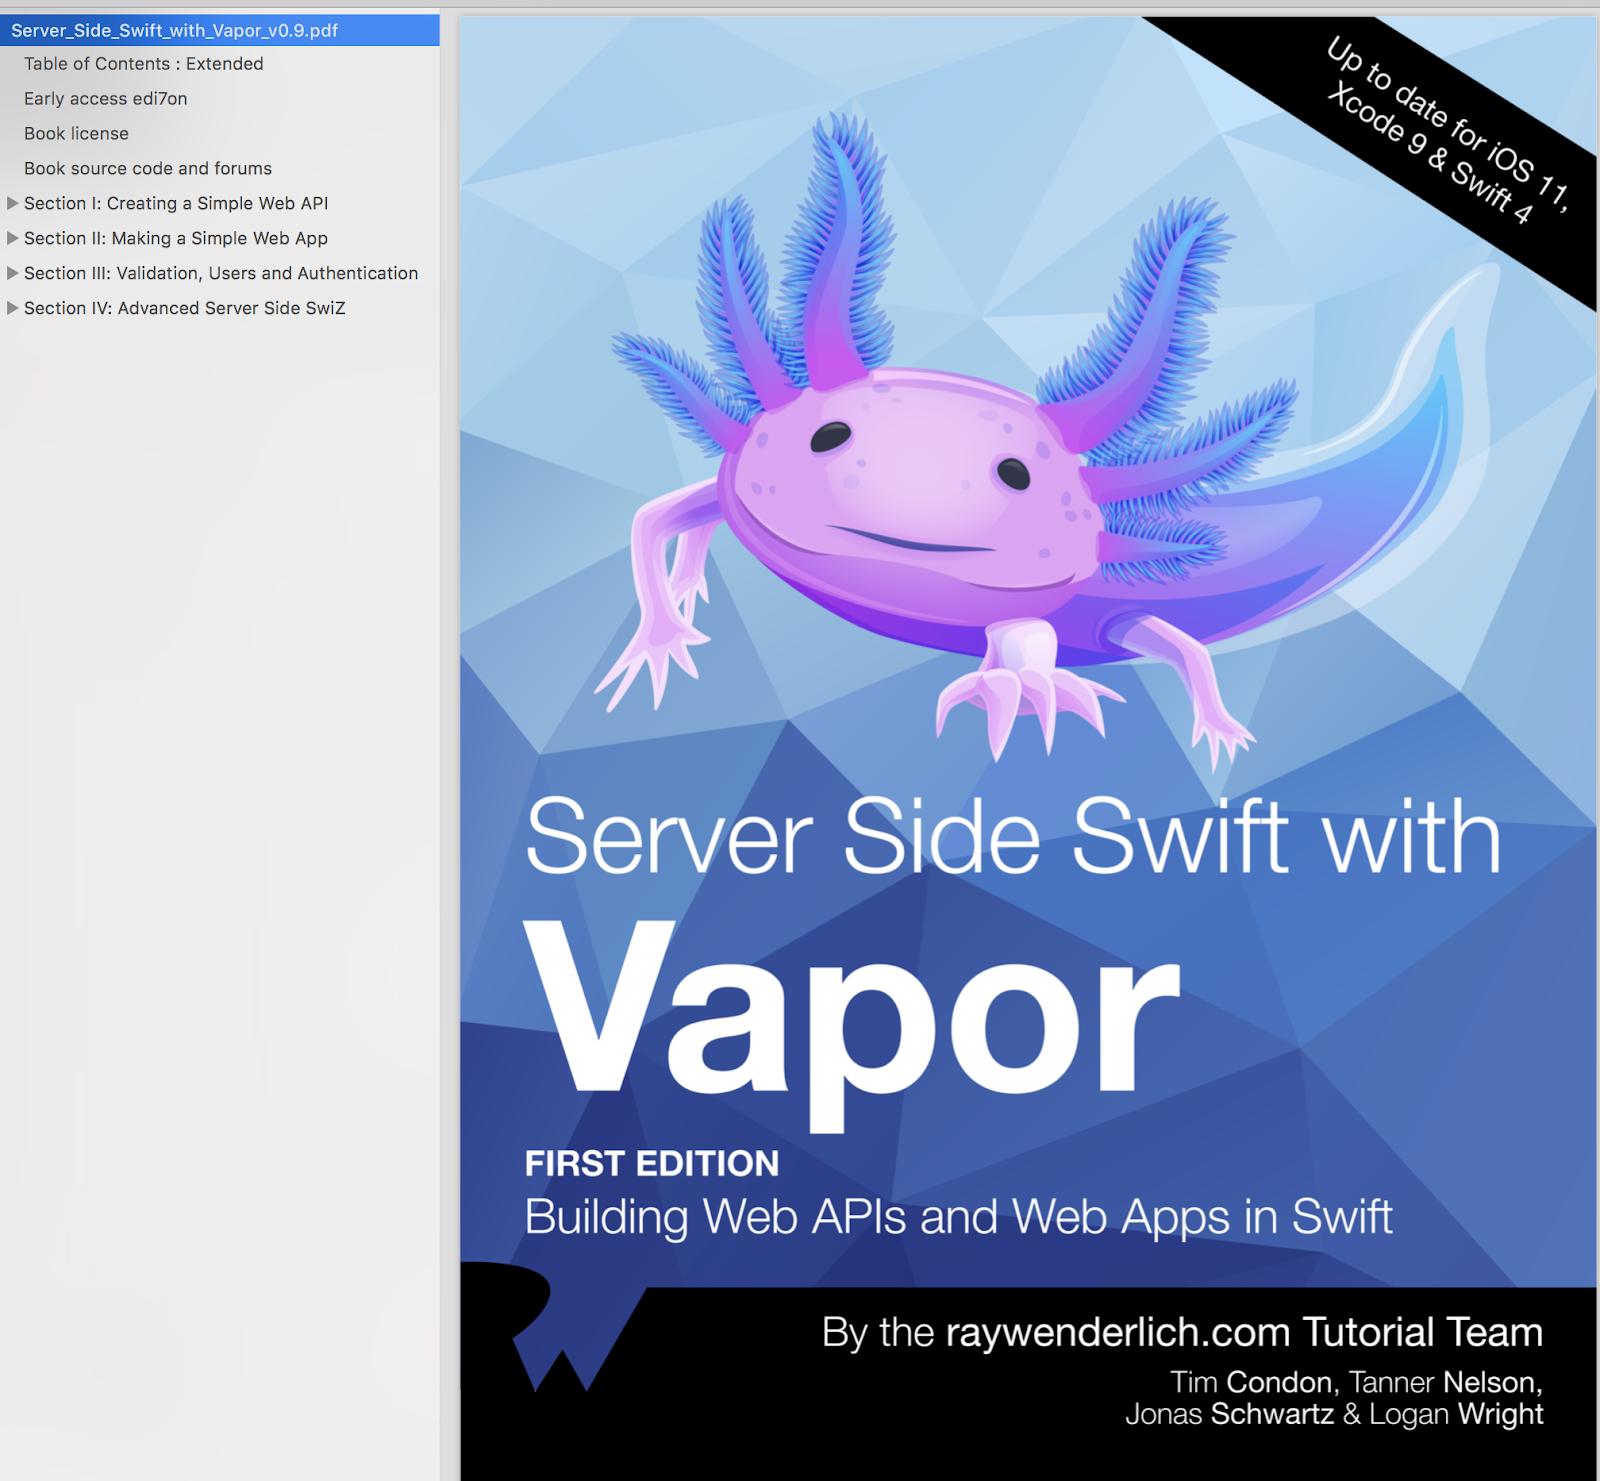 Server Side Swift with Vapor Ray Wenderlich Books PDF, EPUB